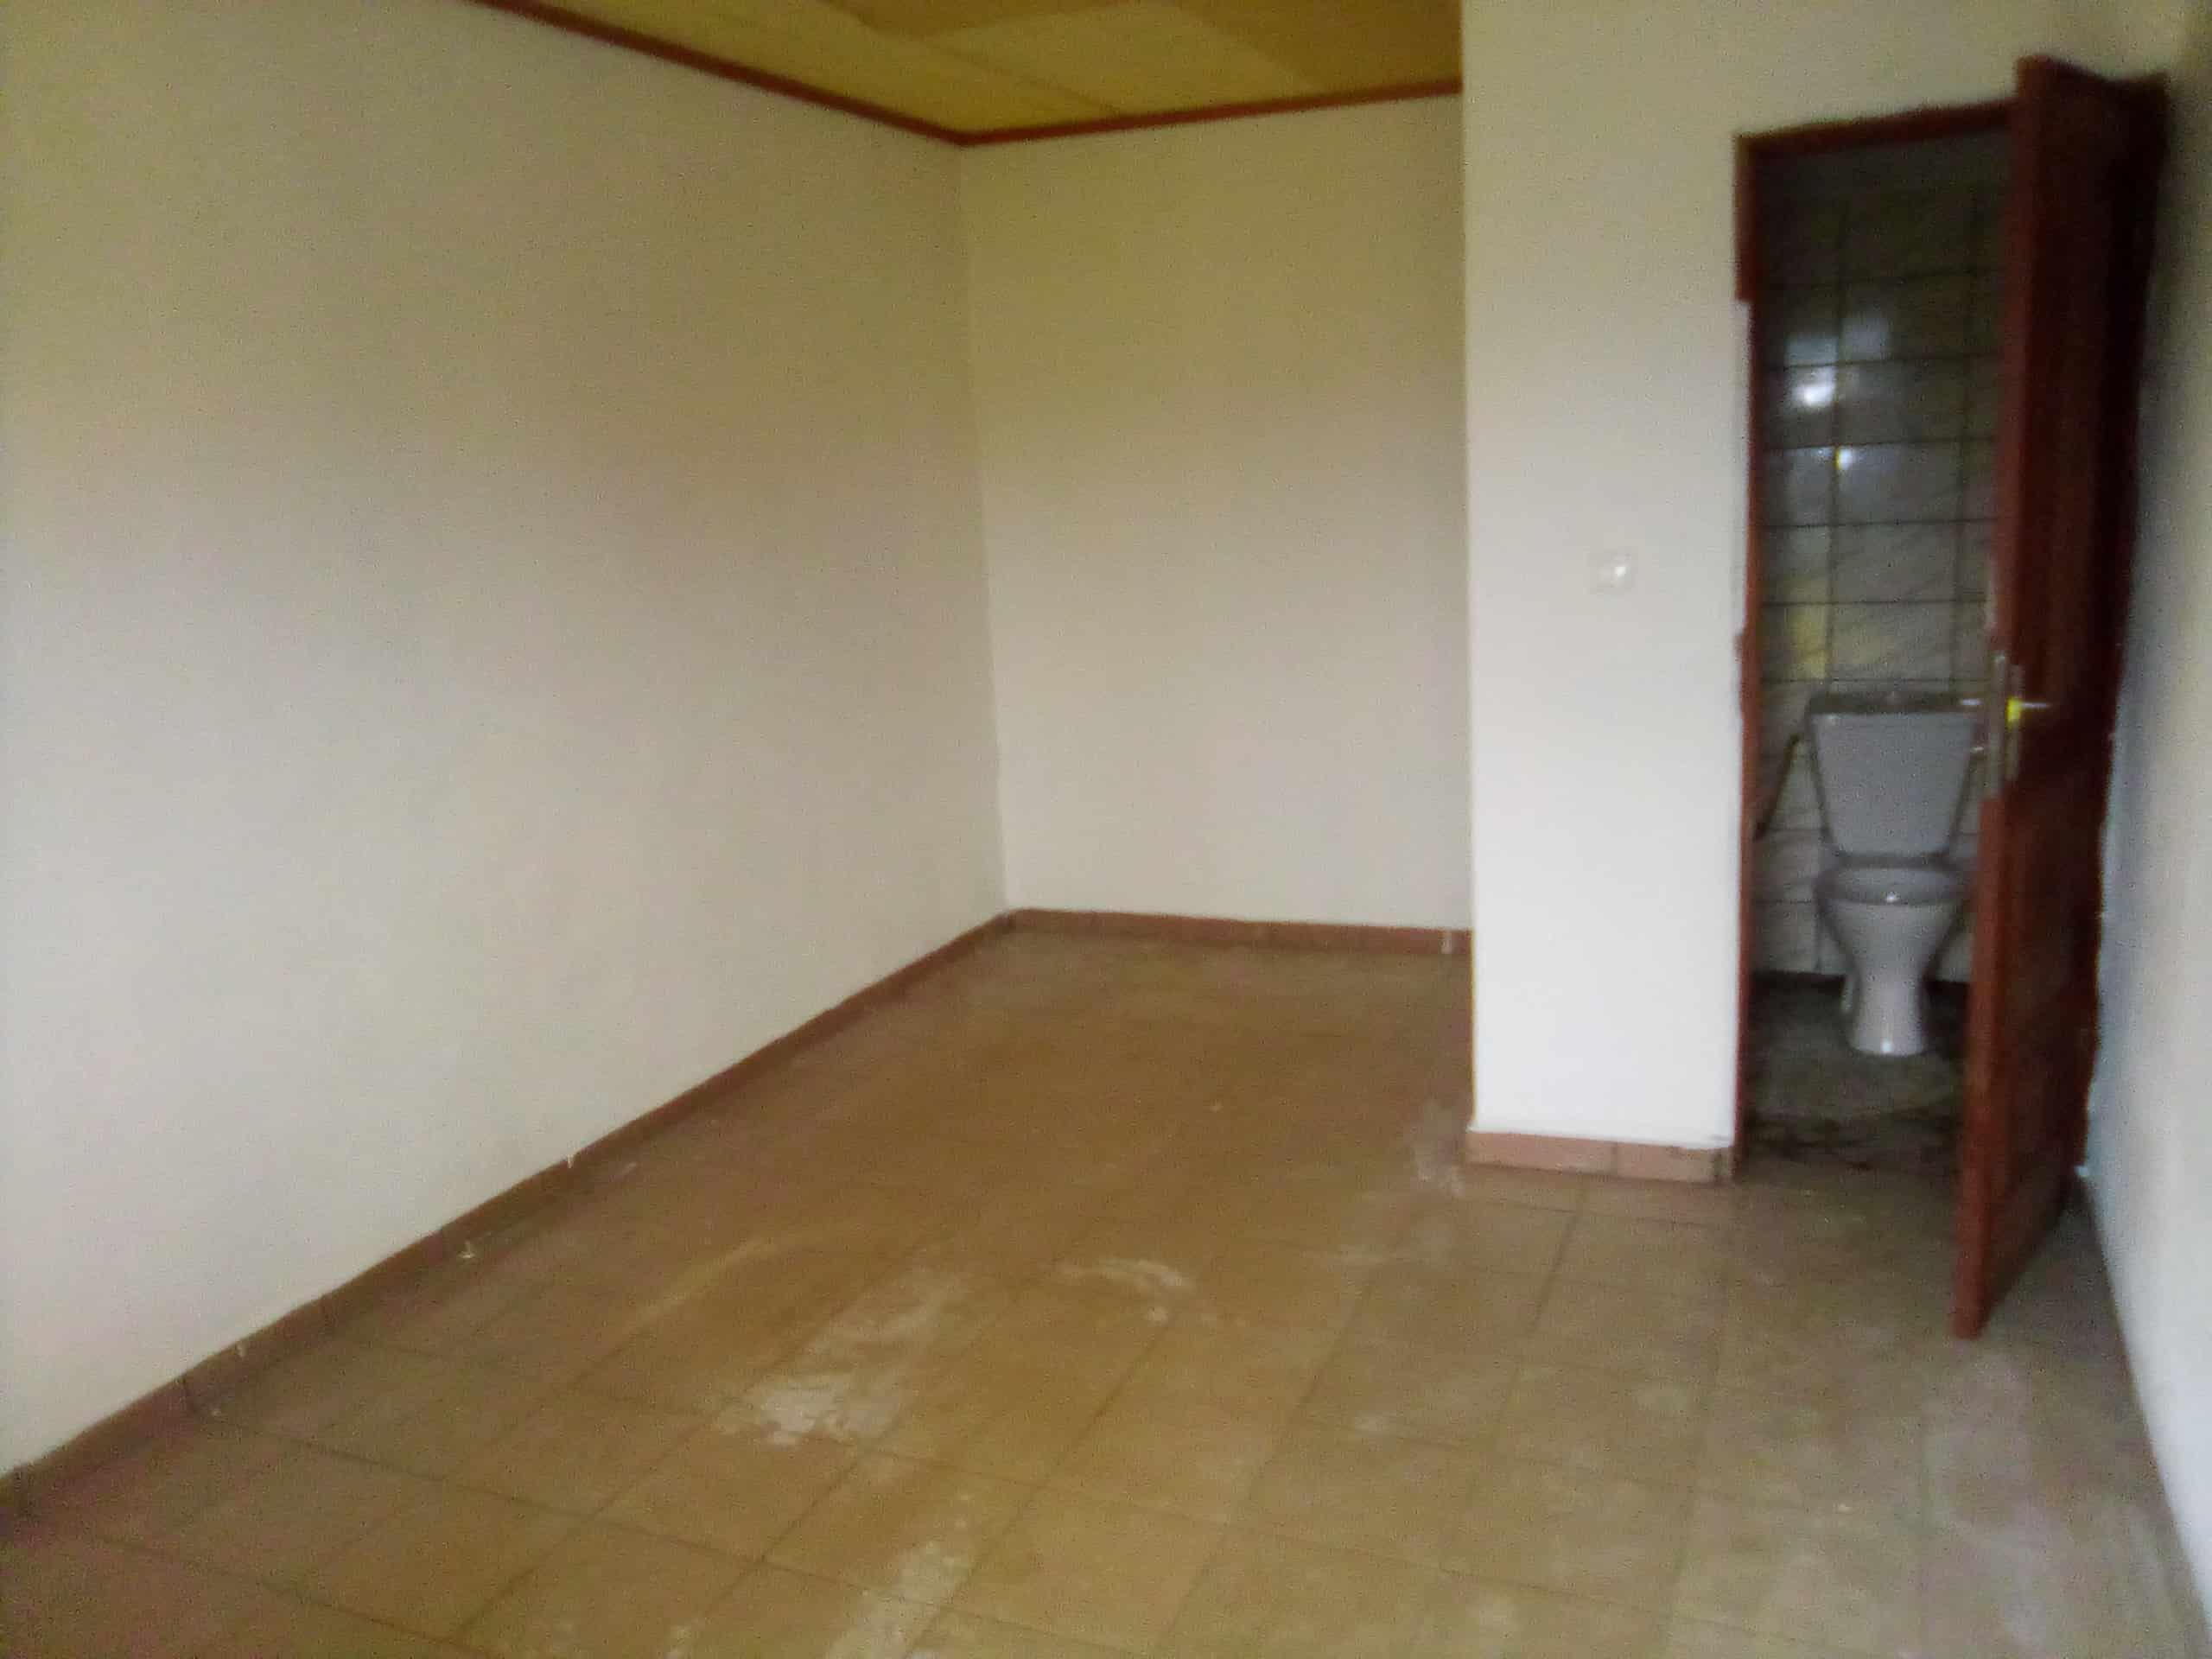 Studio to rent - Douala, Makepe, BM - 35 000 FCFA / month